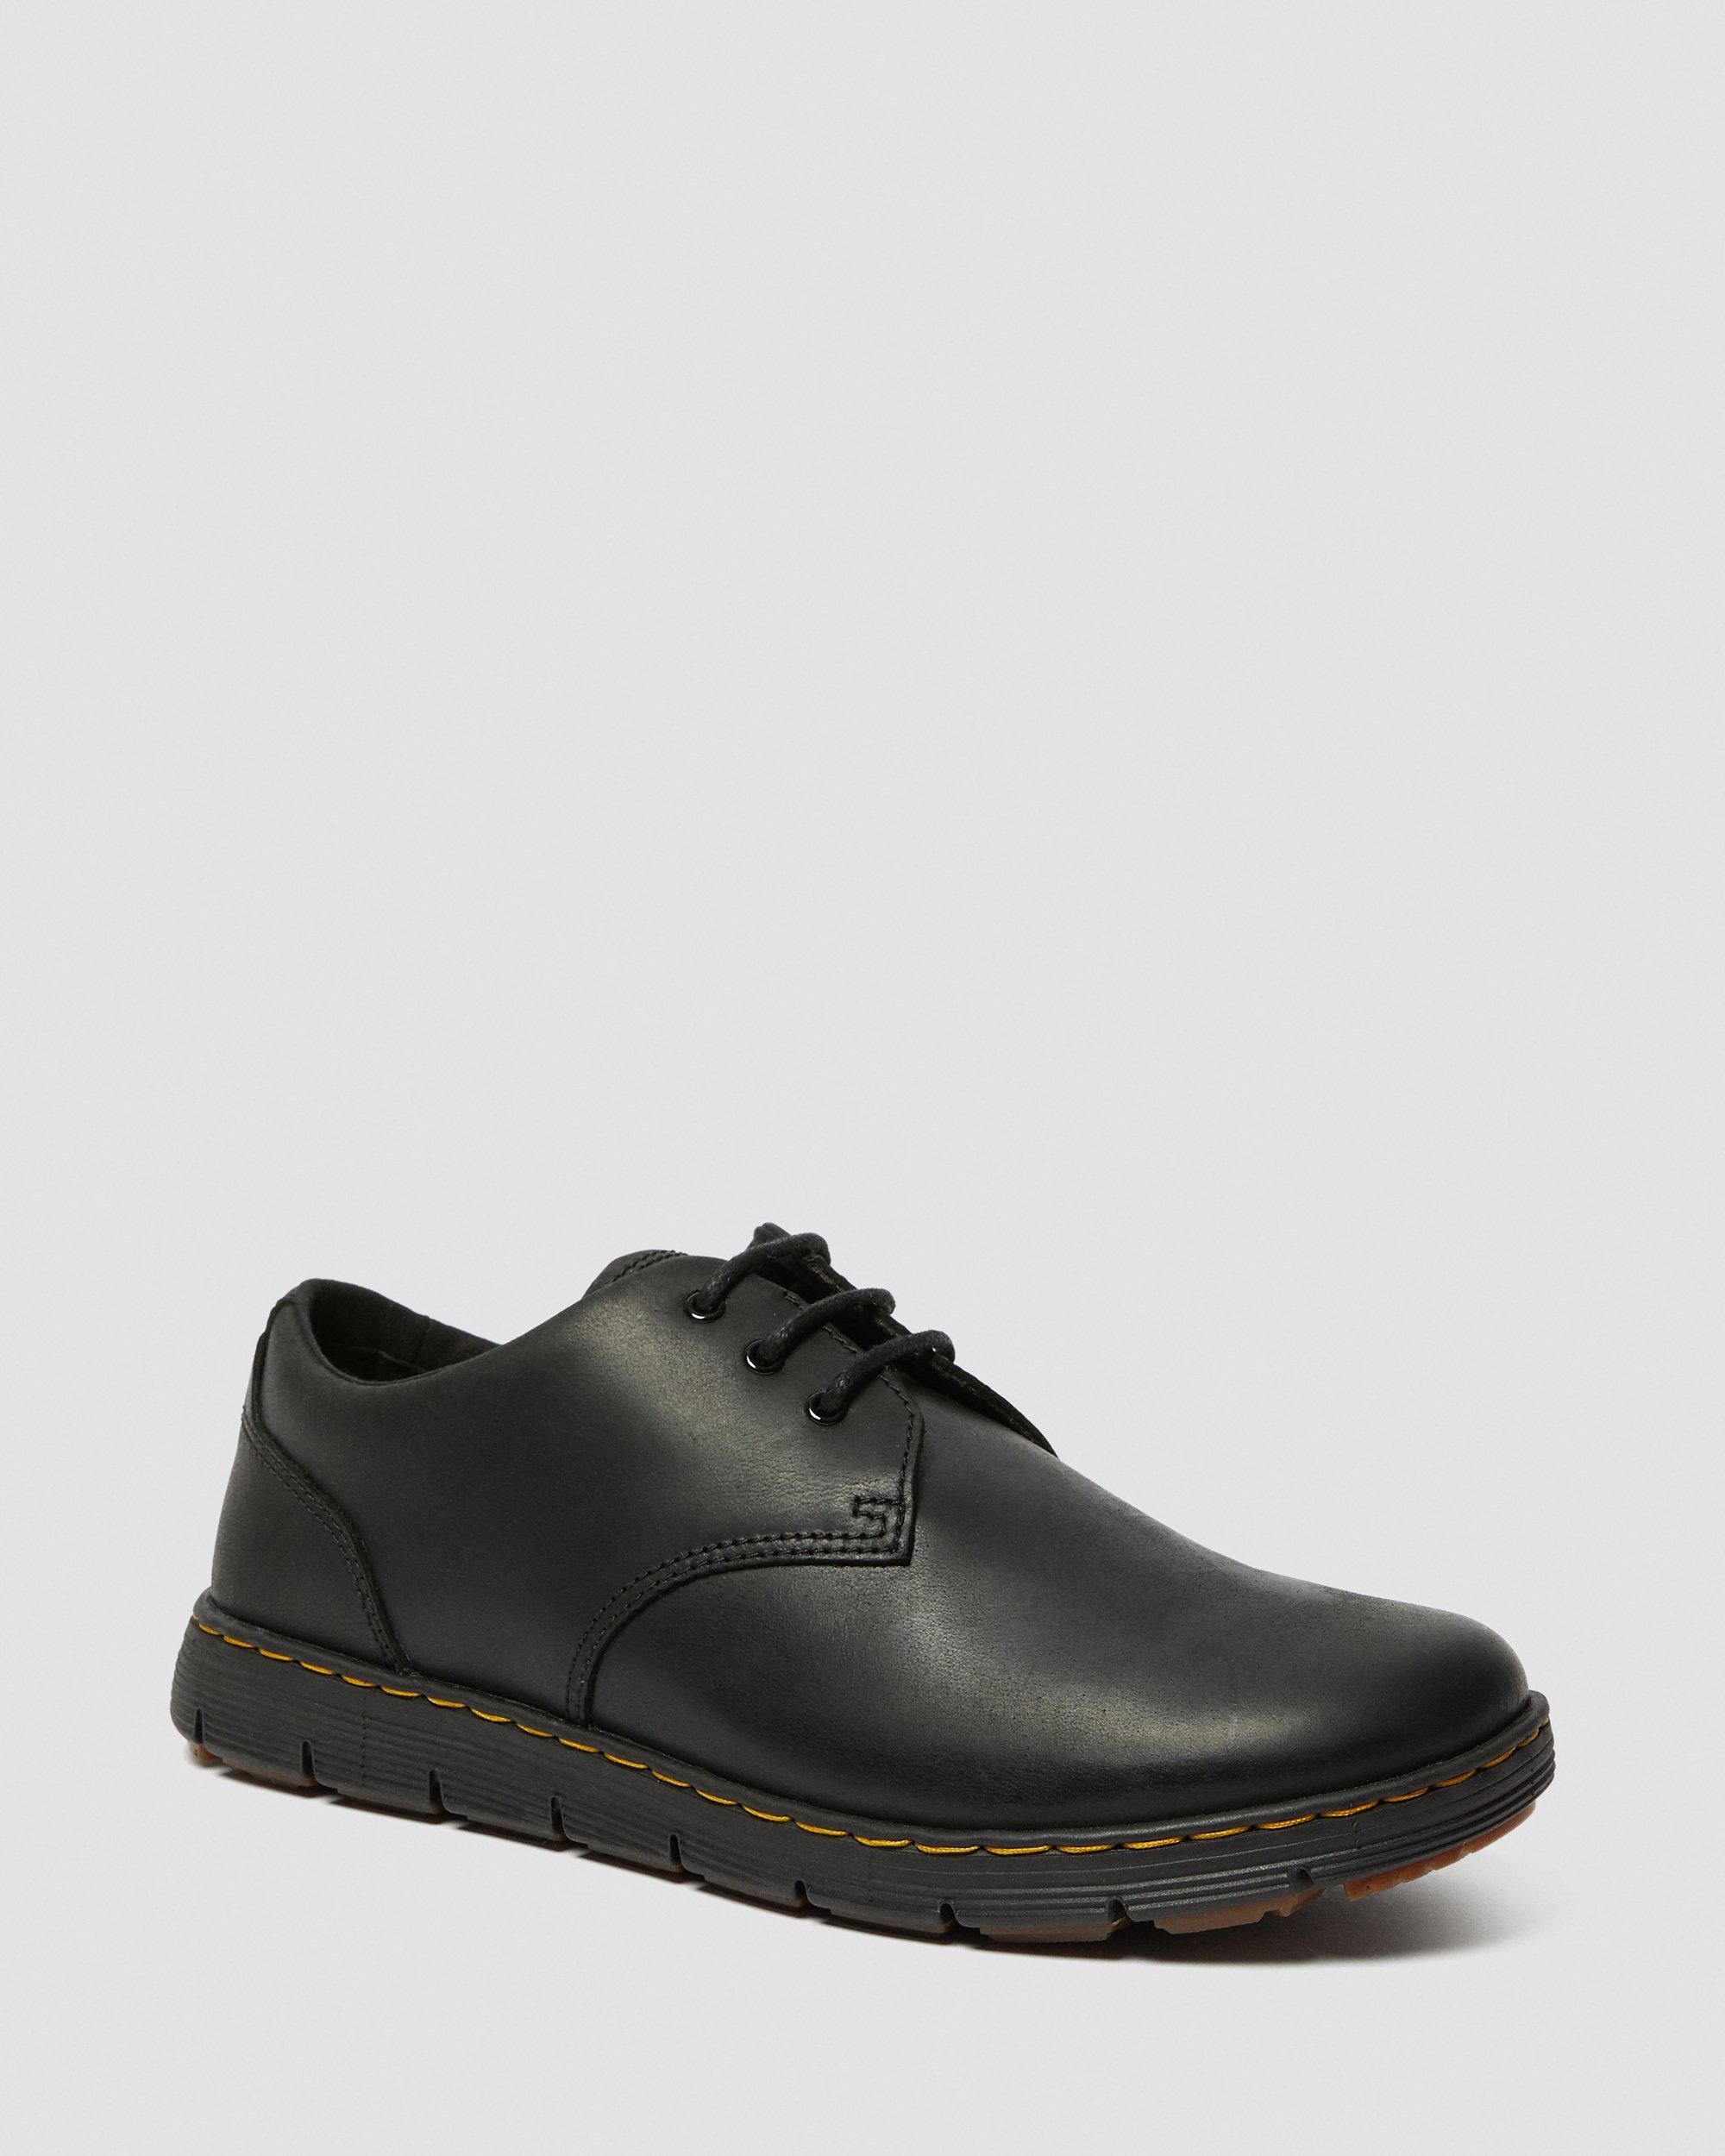 men's casual shoes near me